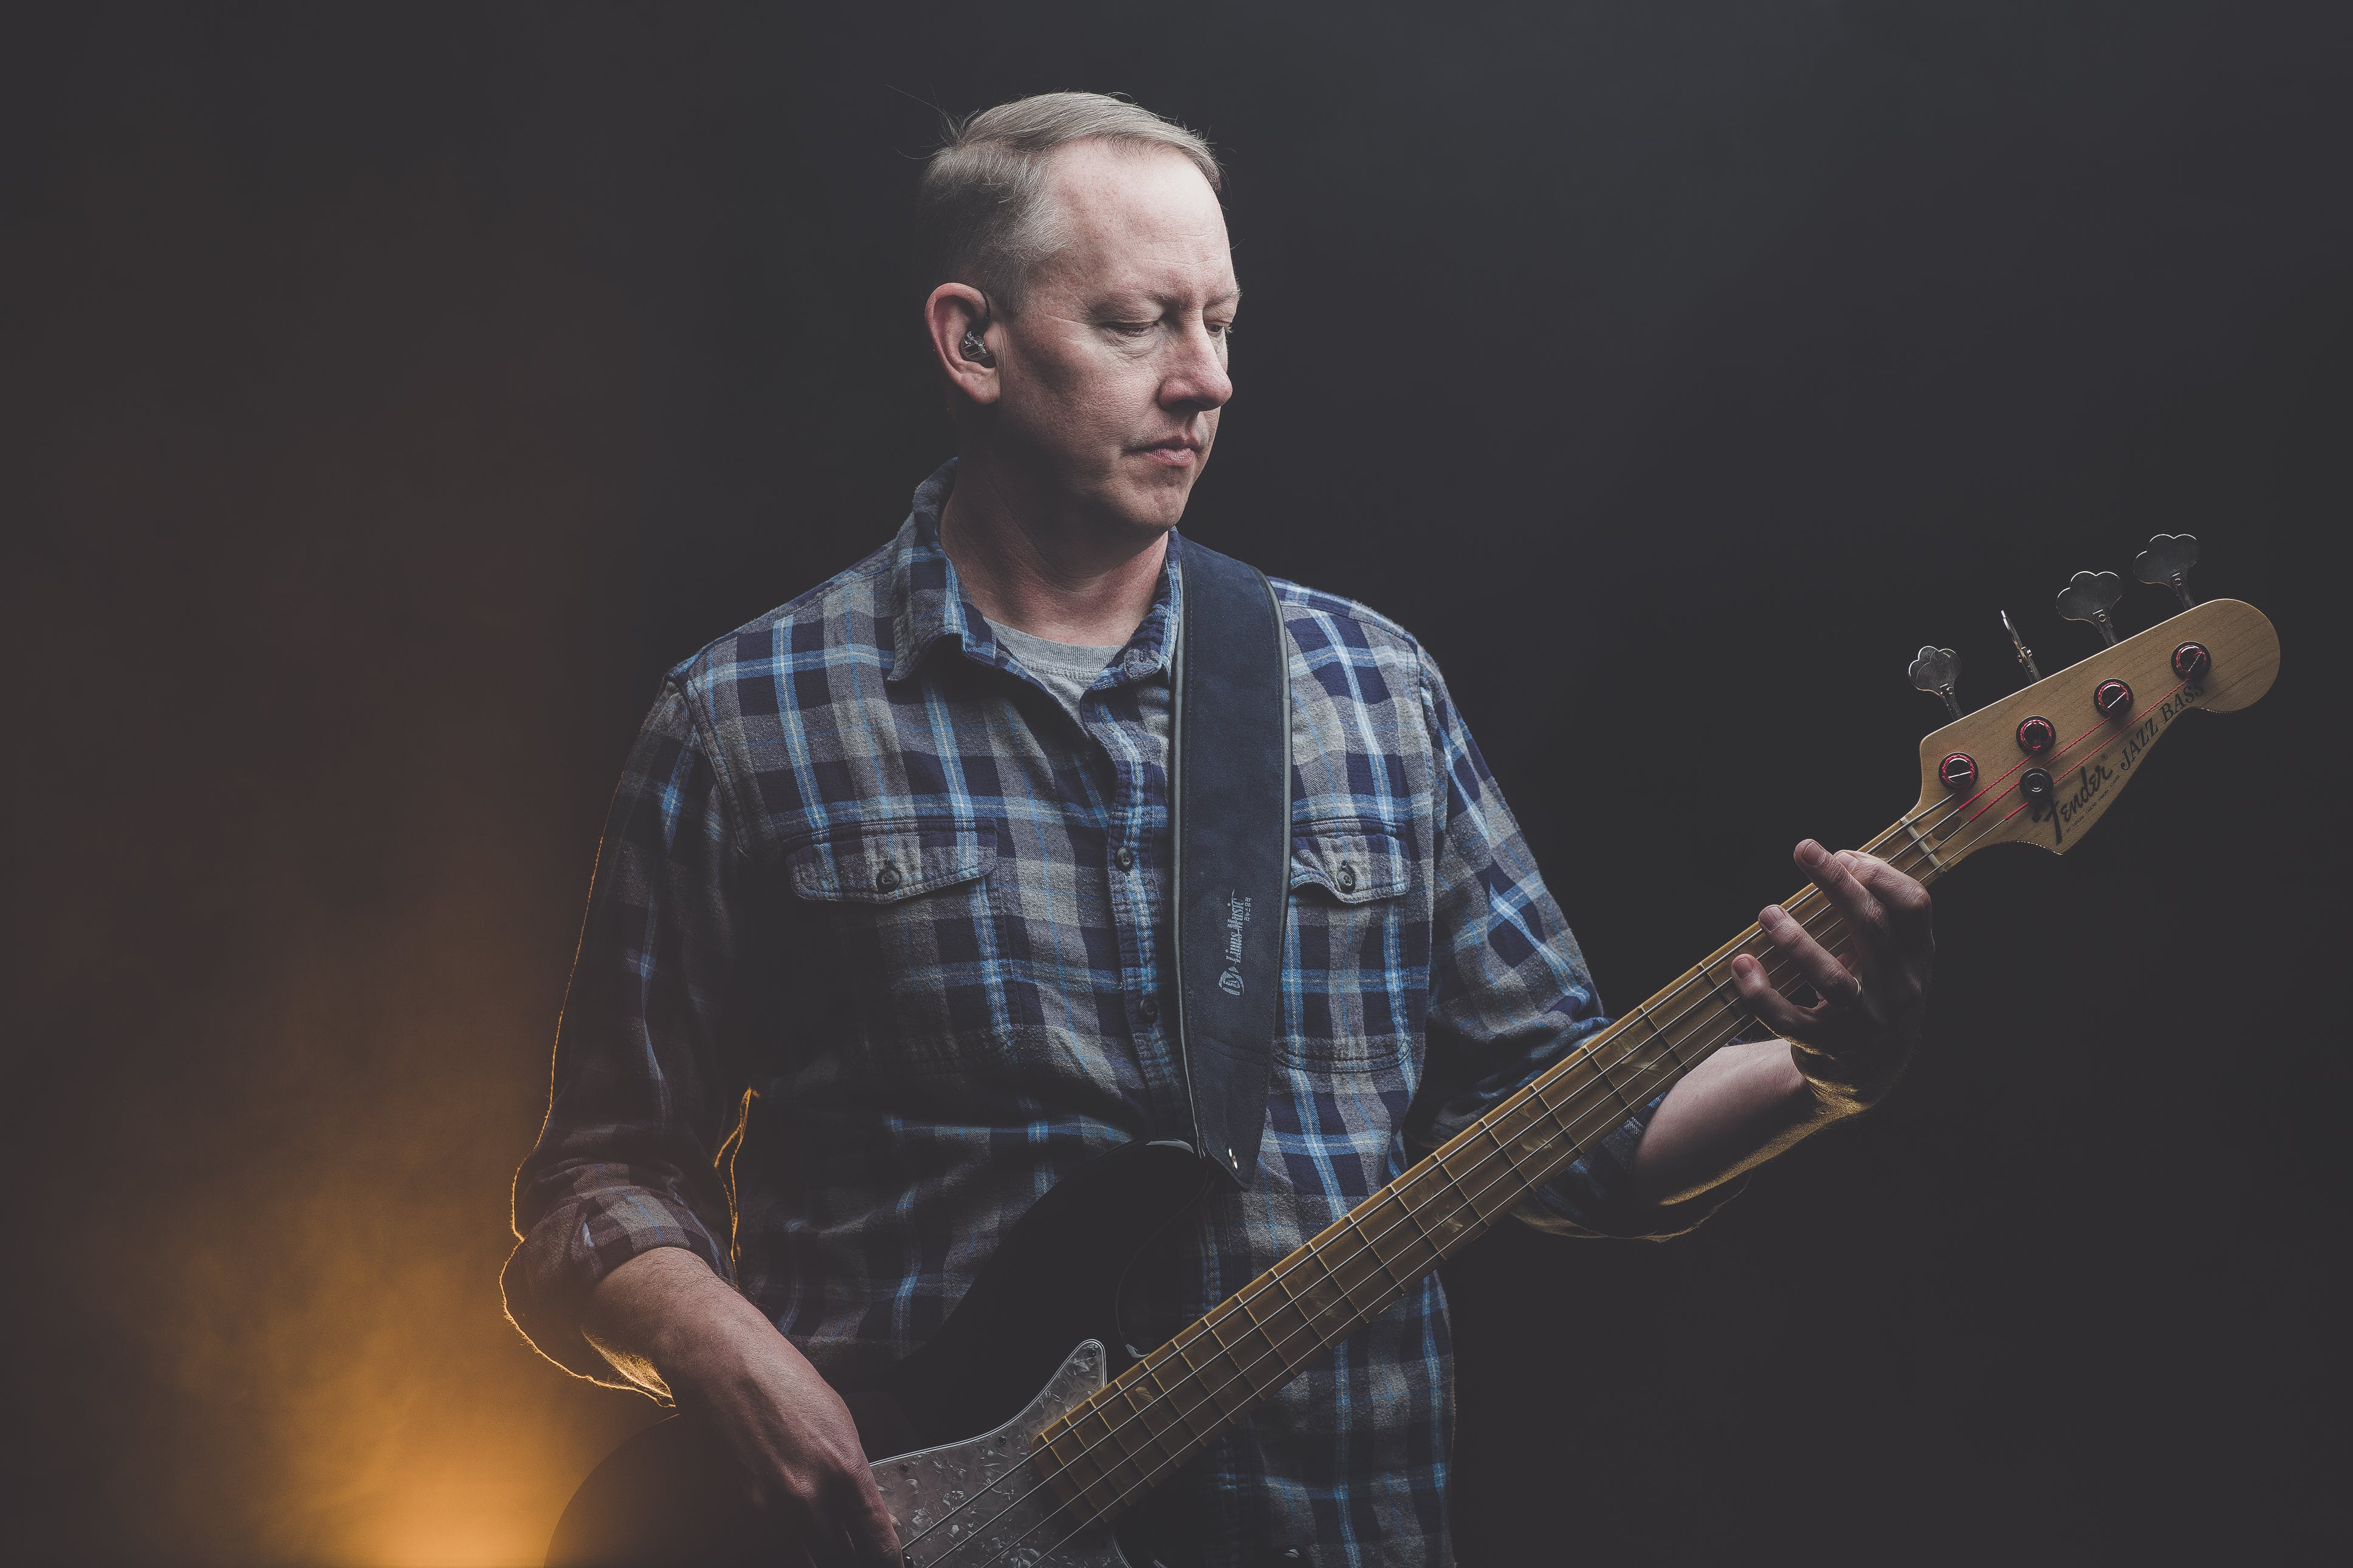 adult, band, bass